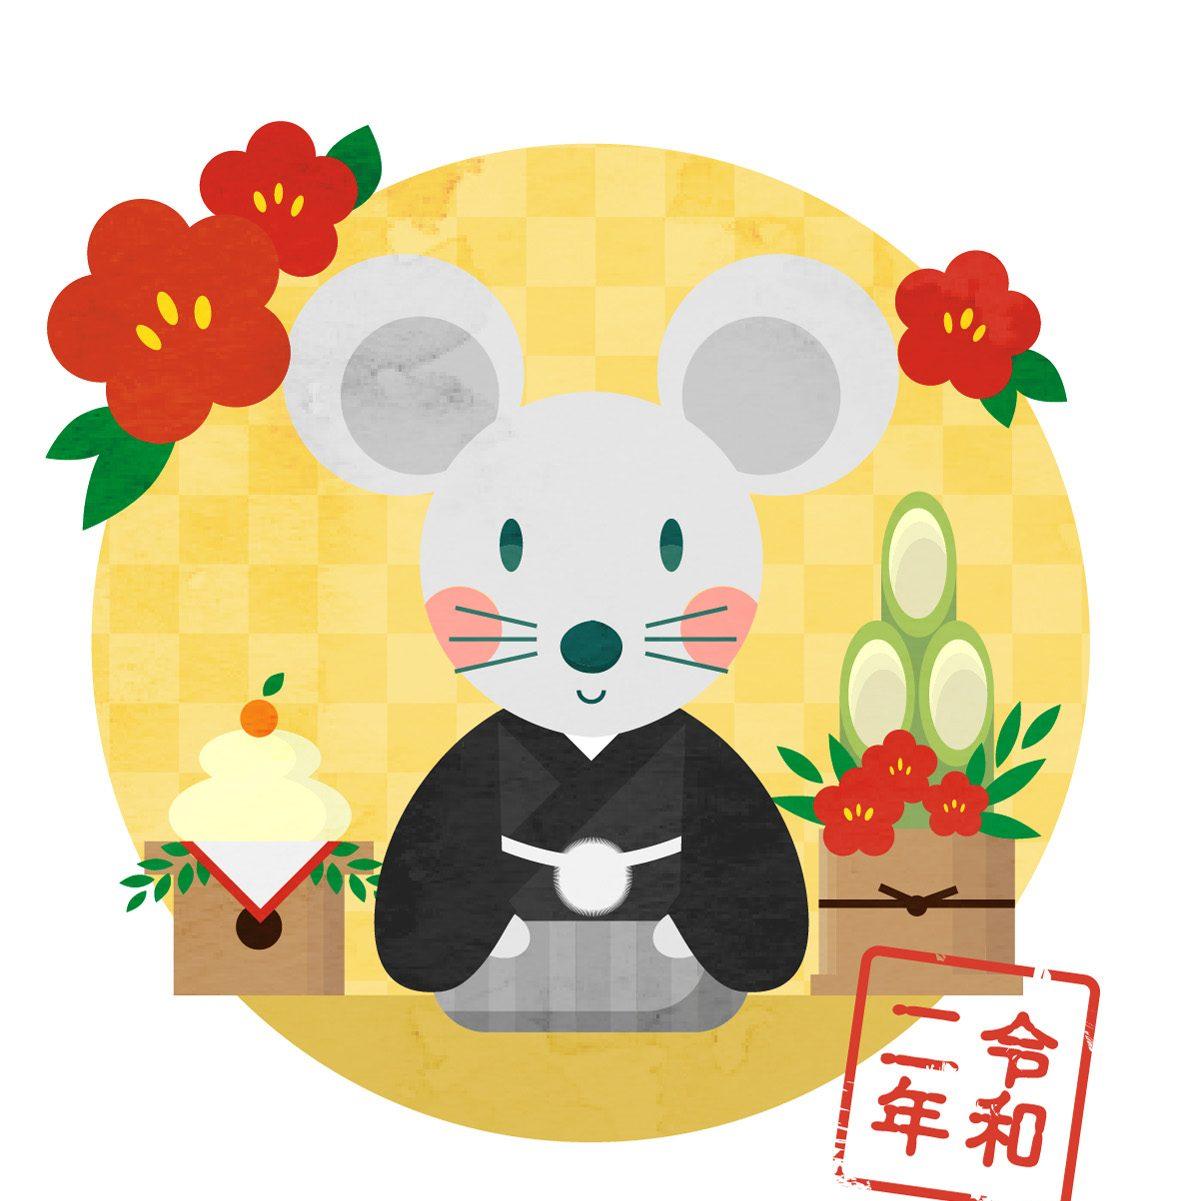 akemashite omedetō gozaimasu: Neujahrsgrüße des Vorstands